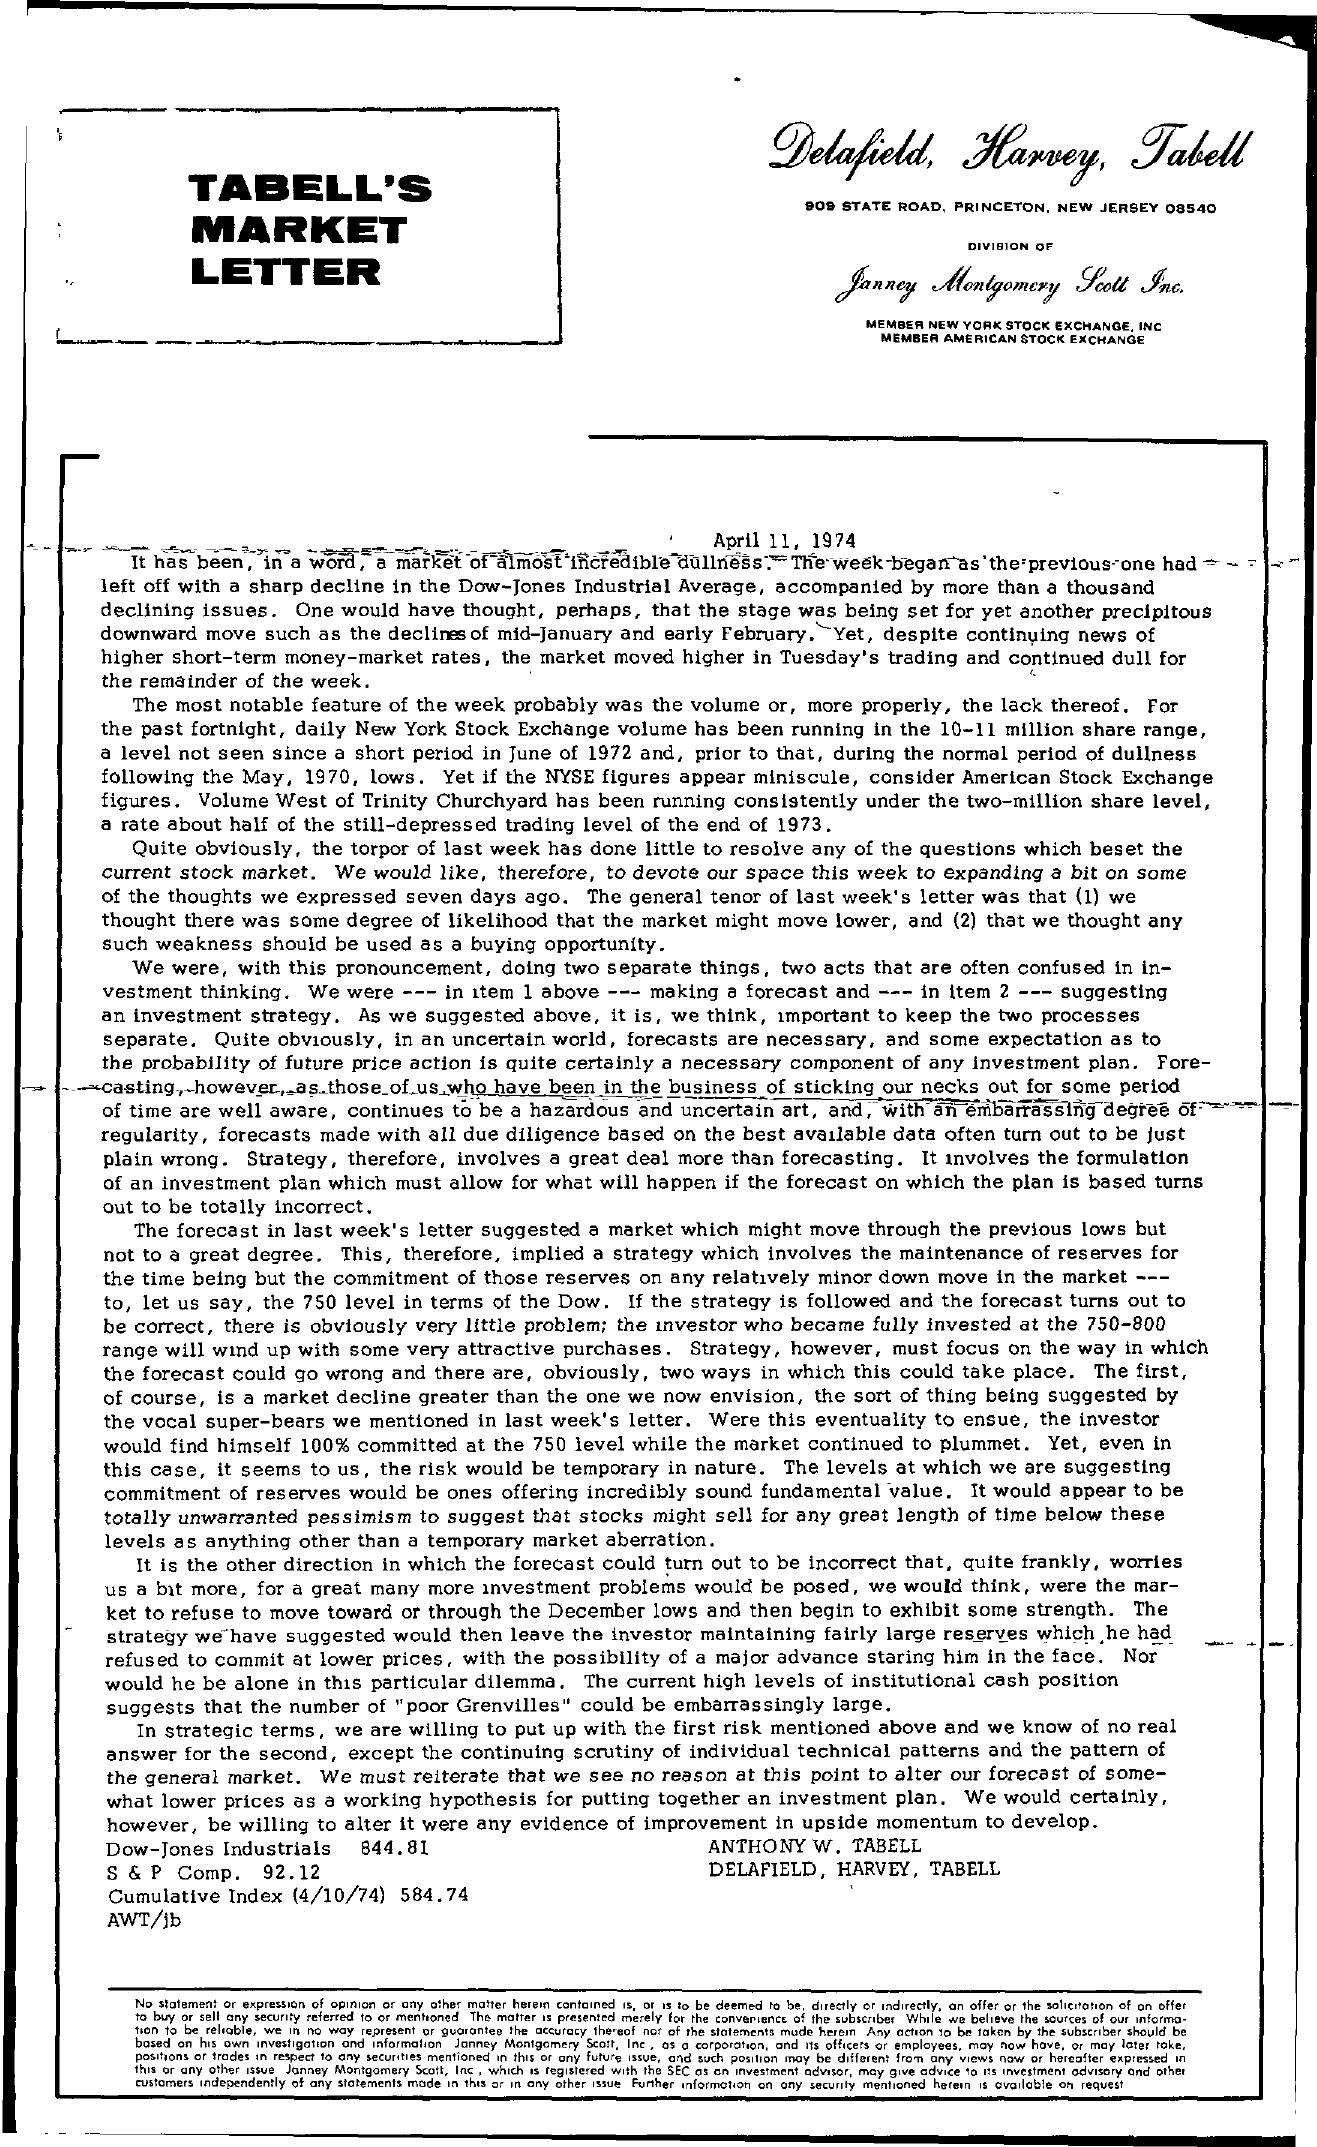 Tabell's Market Letter - April 11, 1974